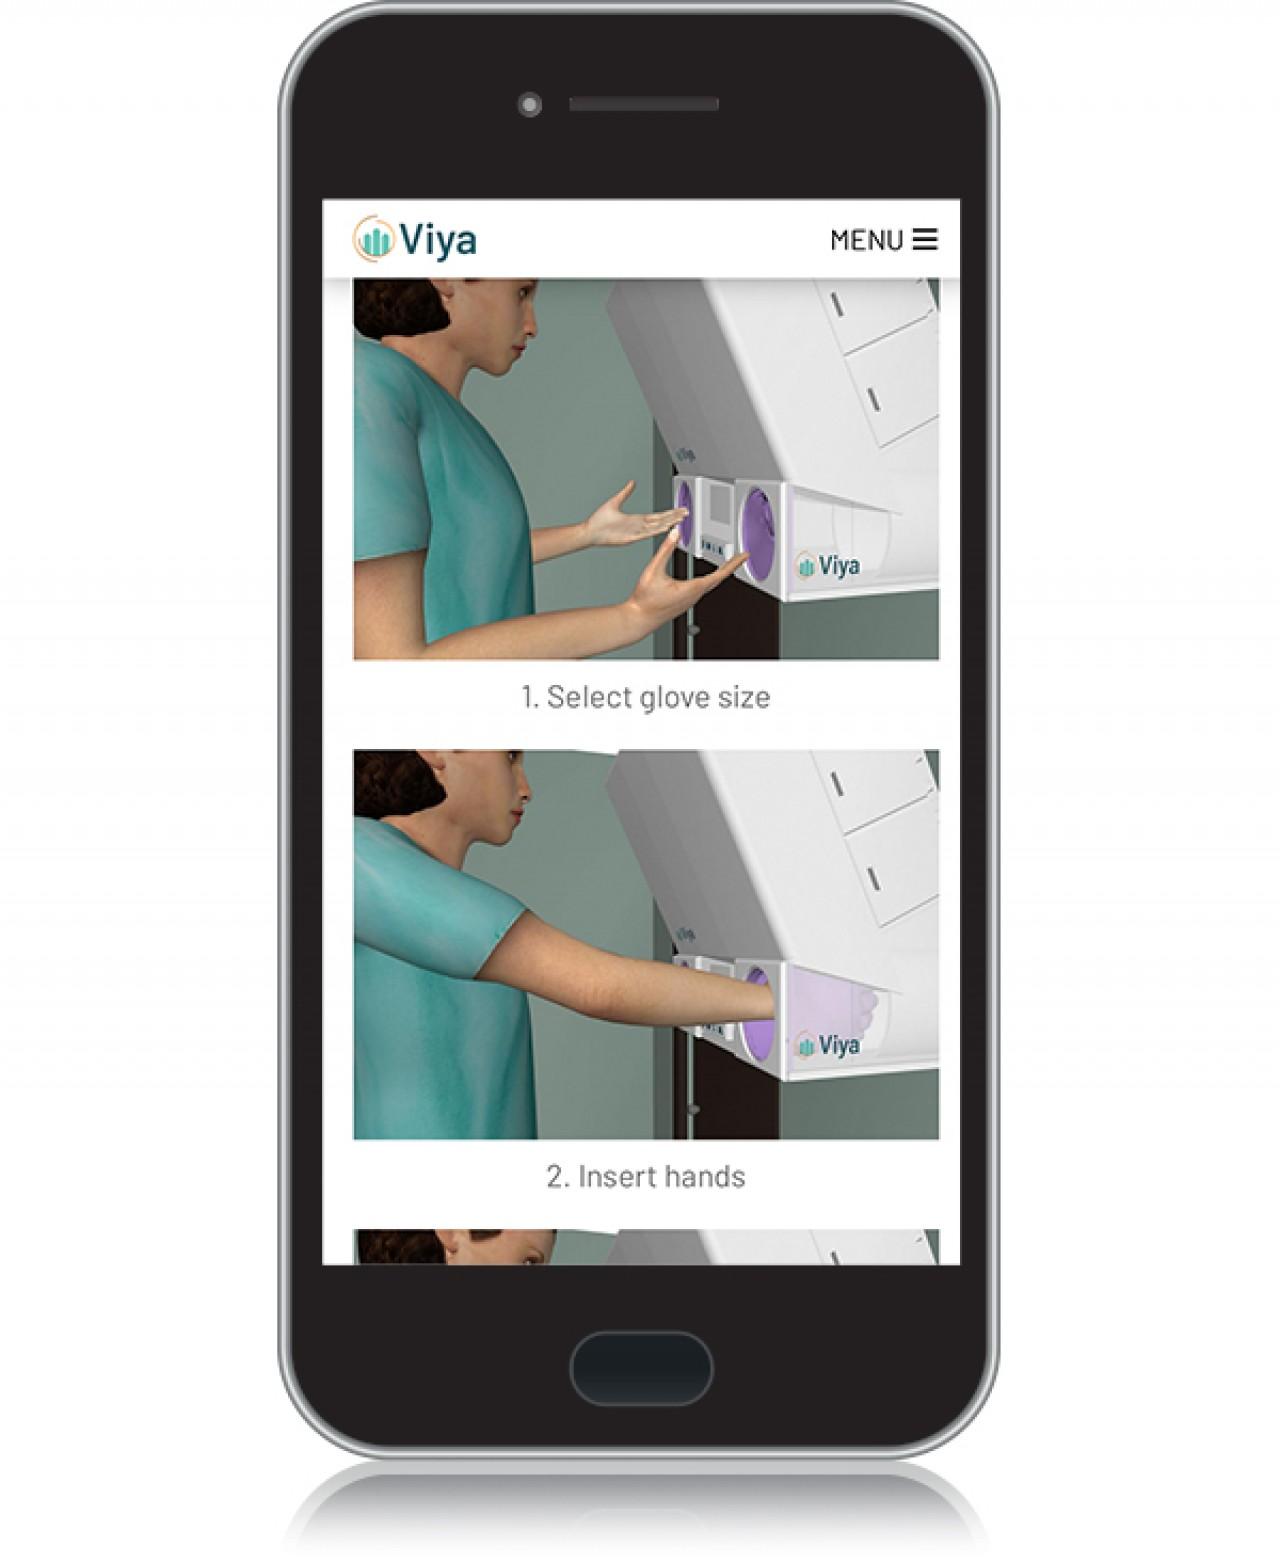 viya step by step instructions on phone